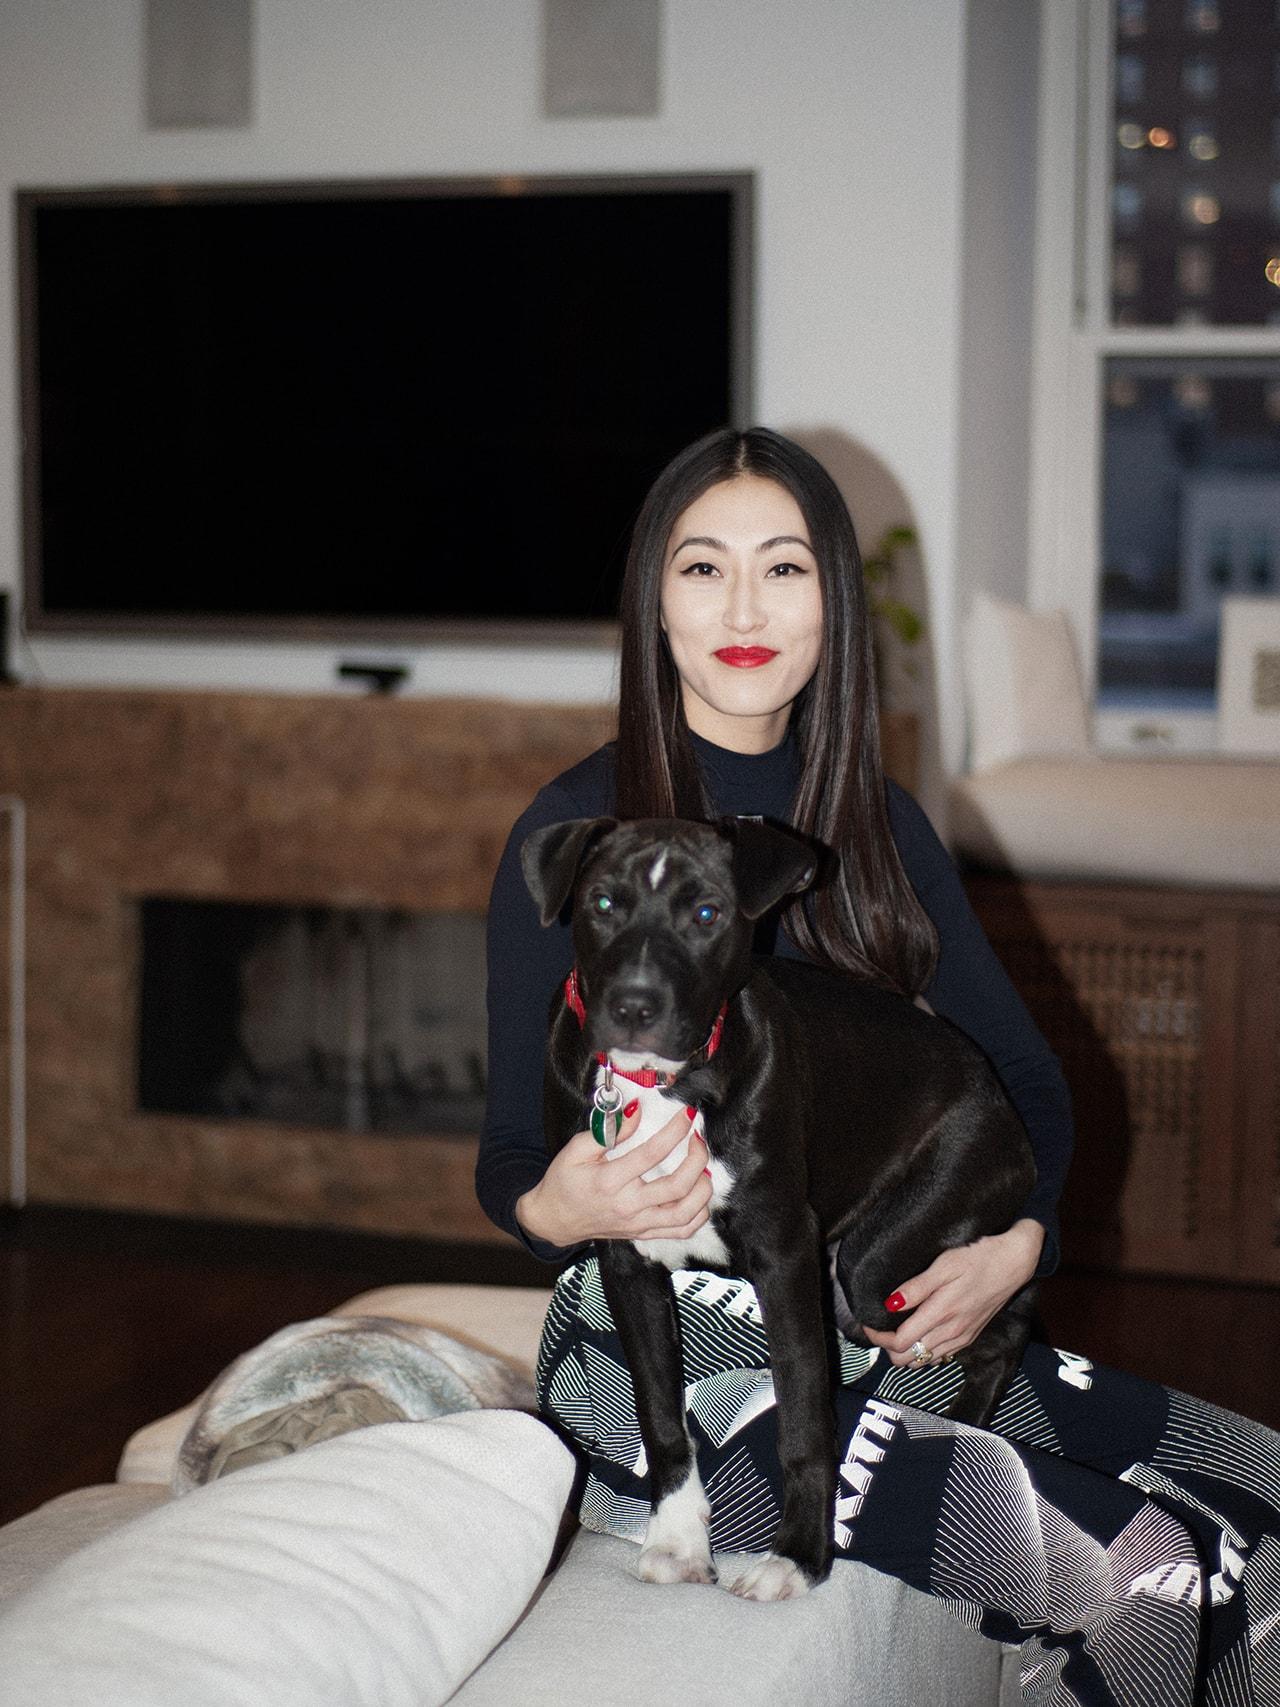 Jackie Kim KITH Women Director Home Book Shelf Decor Leggings Red Lipstick Estee Lauder